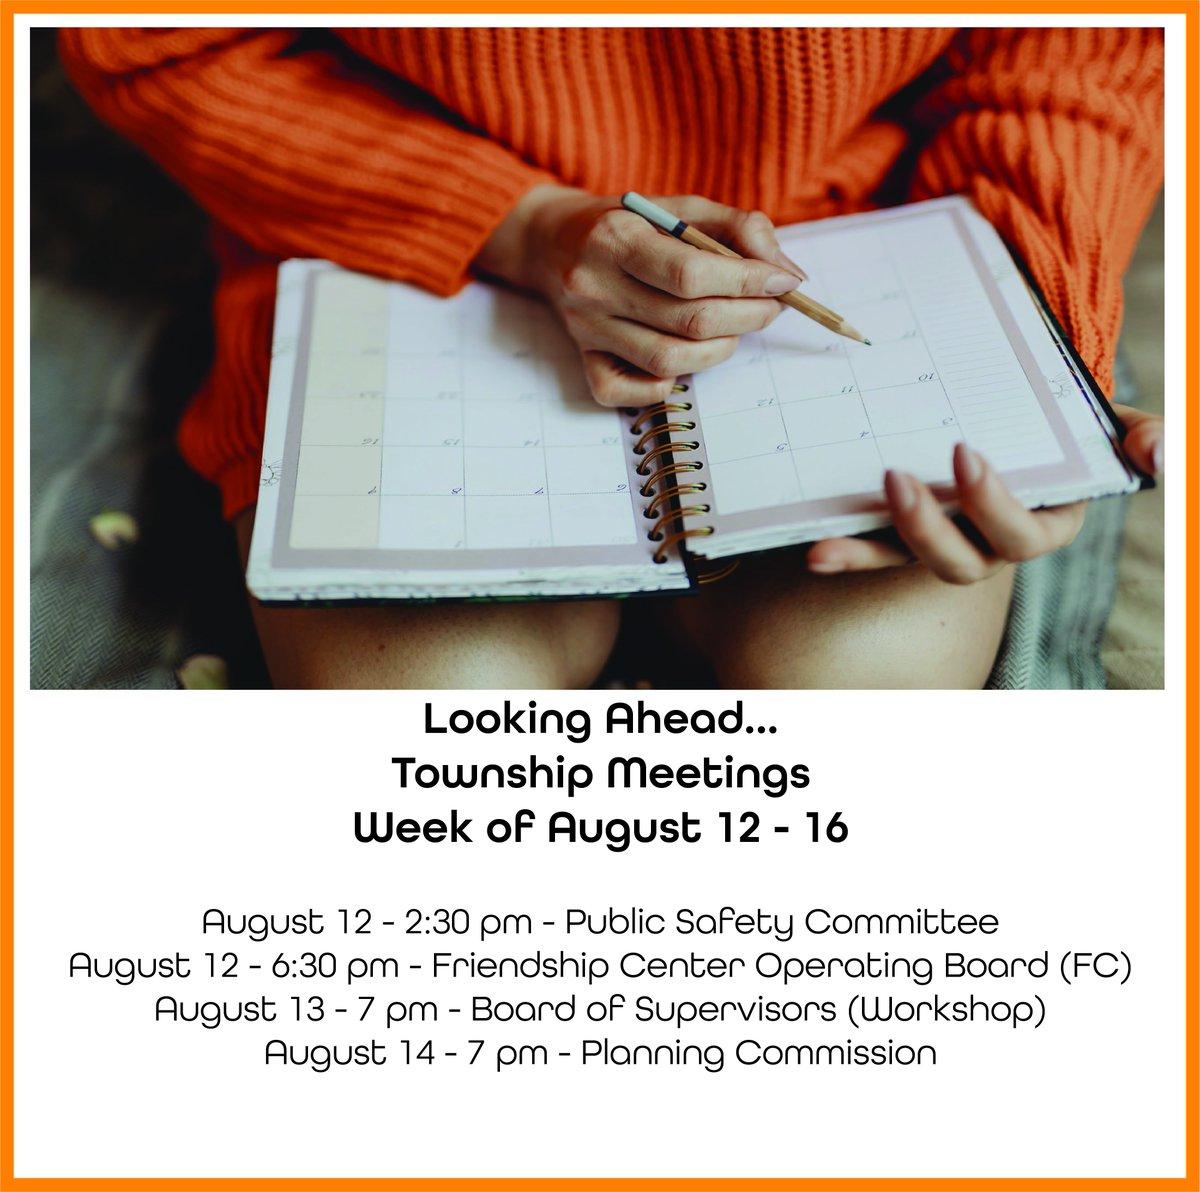 Plan Ahead. Next week's Township Meetings Schedule... #lowerpaxtontwp #stayinformed #ourcommunity